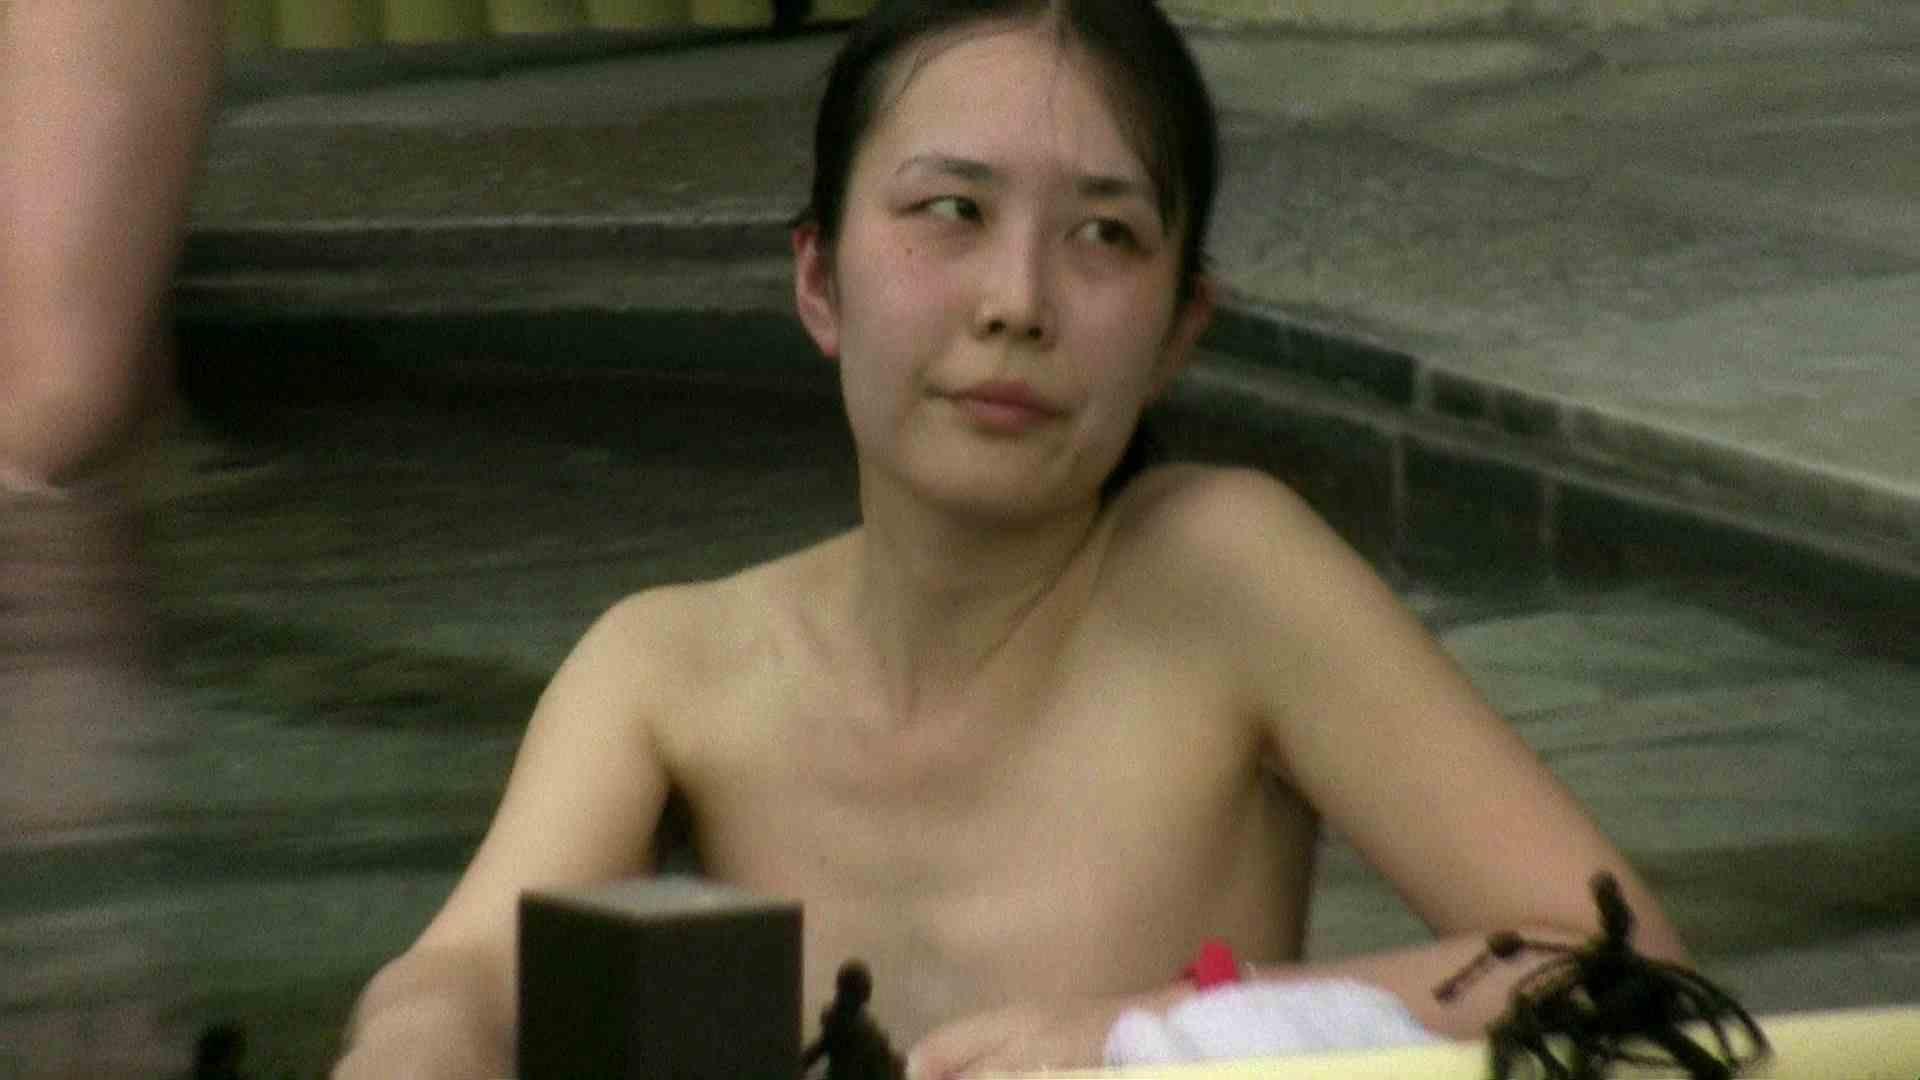 Aquaな露天風呂Vol.636 女体盗撮 盗み撮りSEX無修正画像 87連発 71